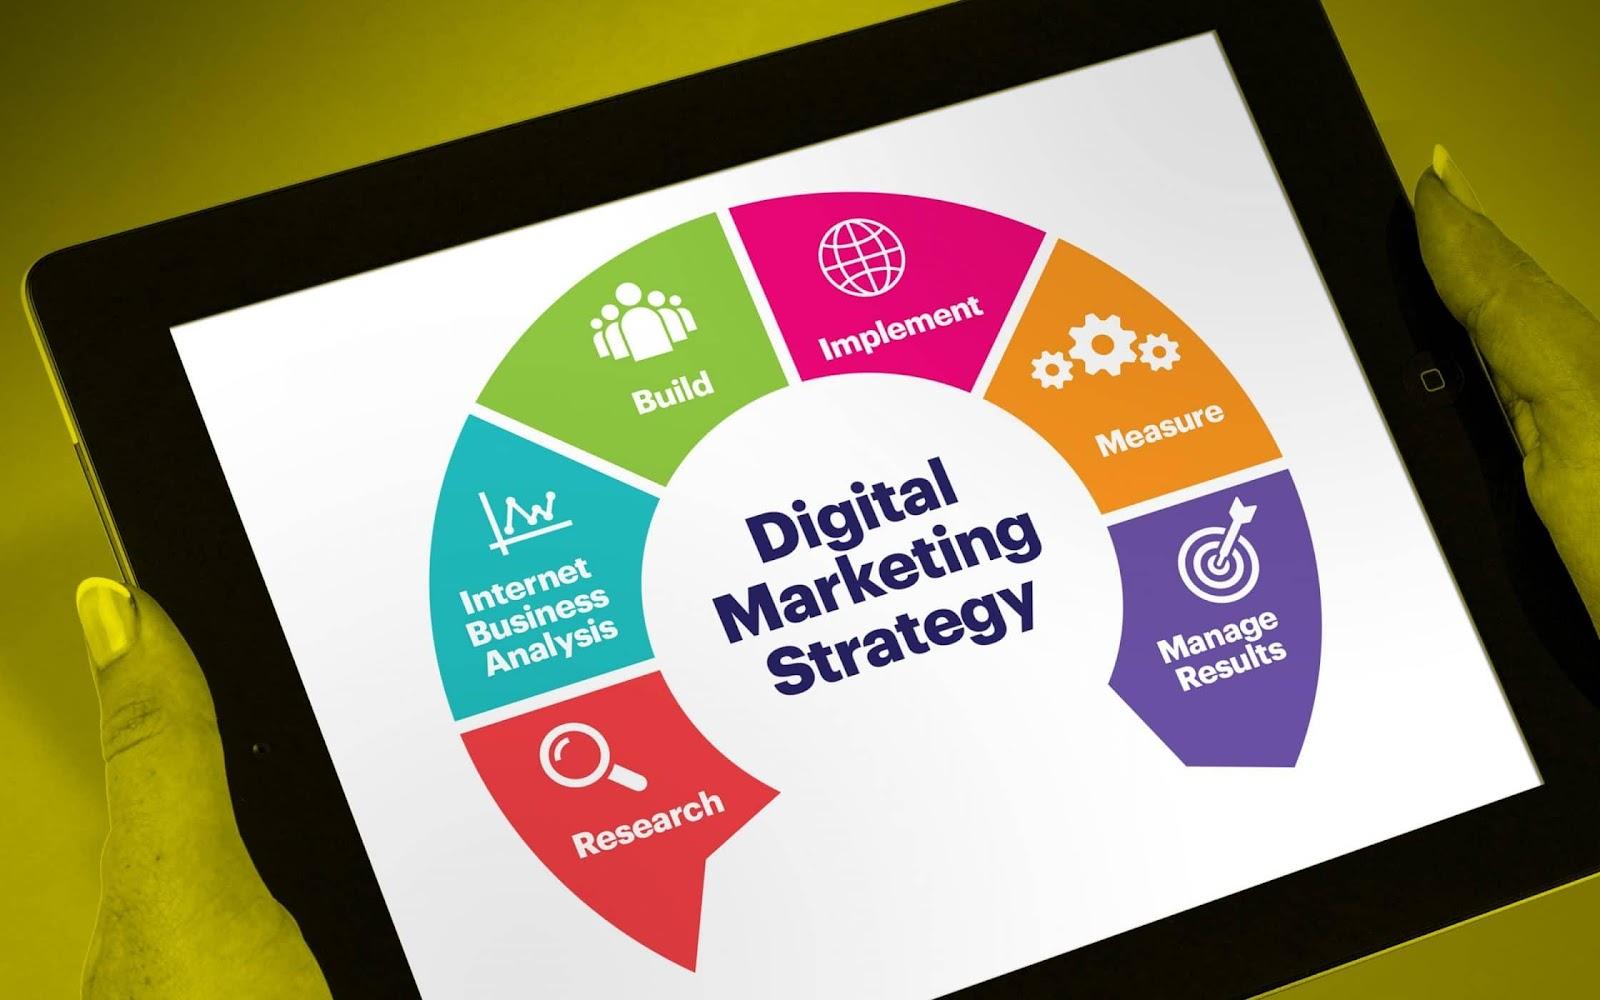 D:\furqan\Selecta Training\SEO\PDF\Digital marketing training 2.jpg